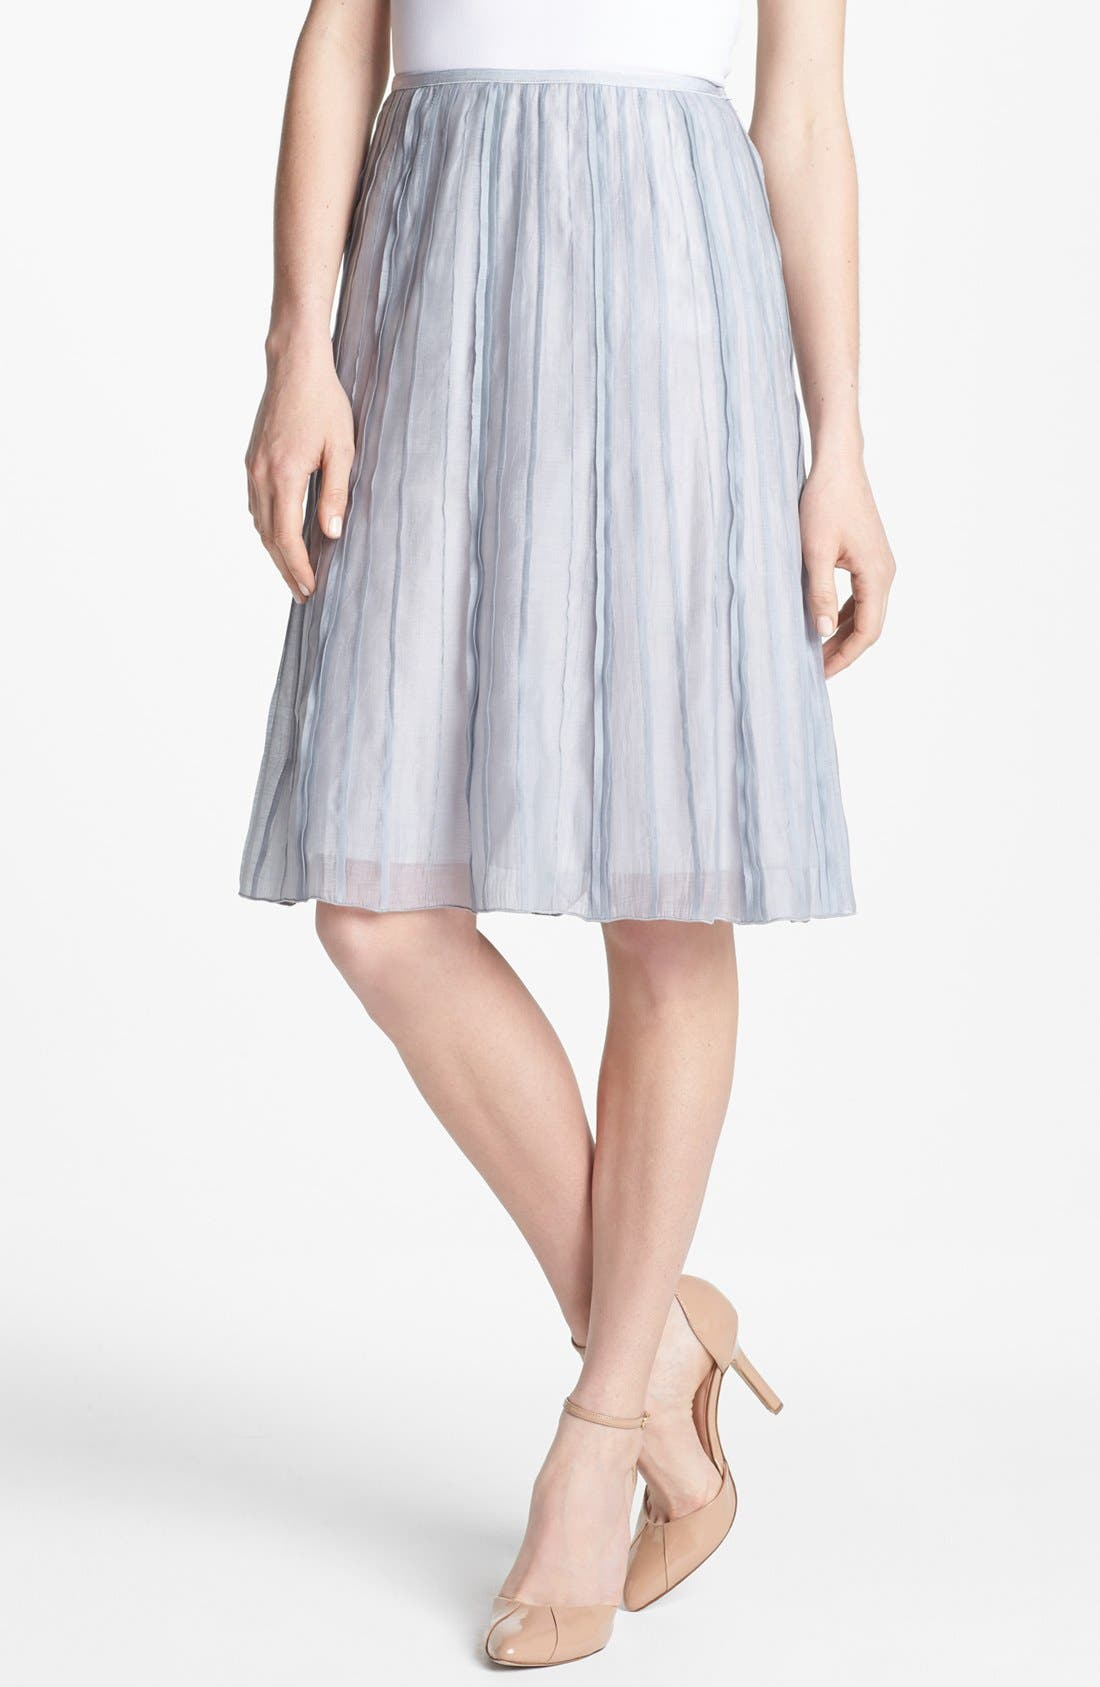 Alternate Image 1 Selected - Nic + Zoe 'Batiste' Flared Skirt (Petite)